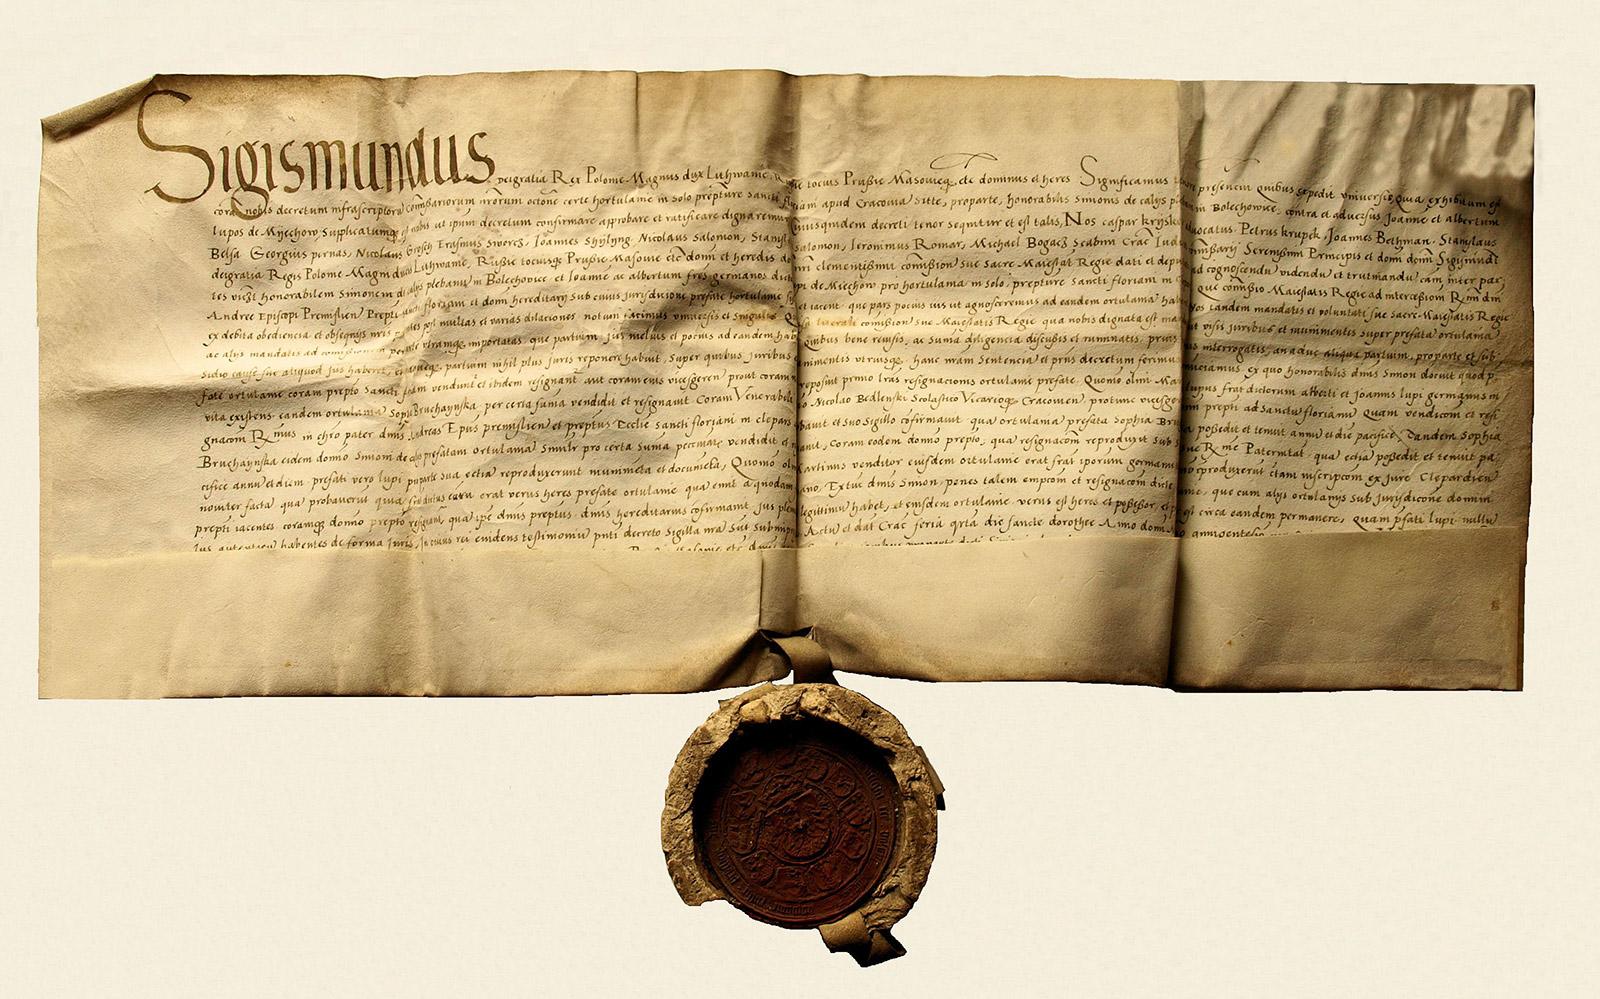 Sigismundus 1527 r.